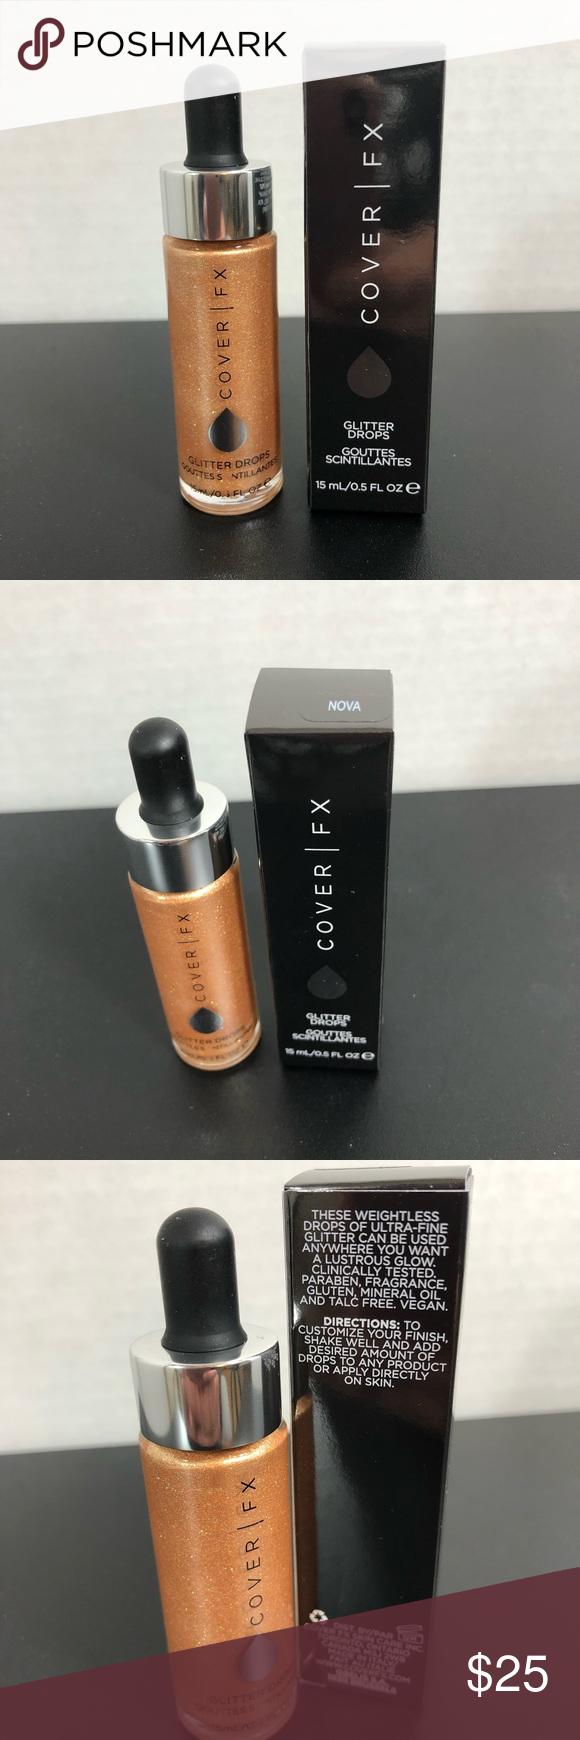 RV44 NWT Cover FX Glitter Drops NOVA Cover fx makeup